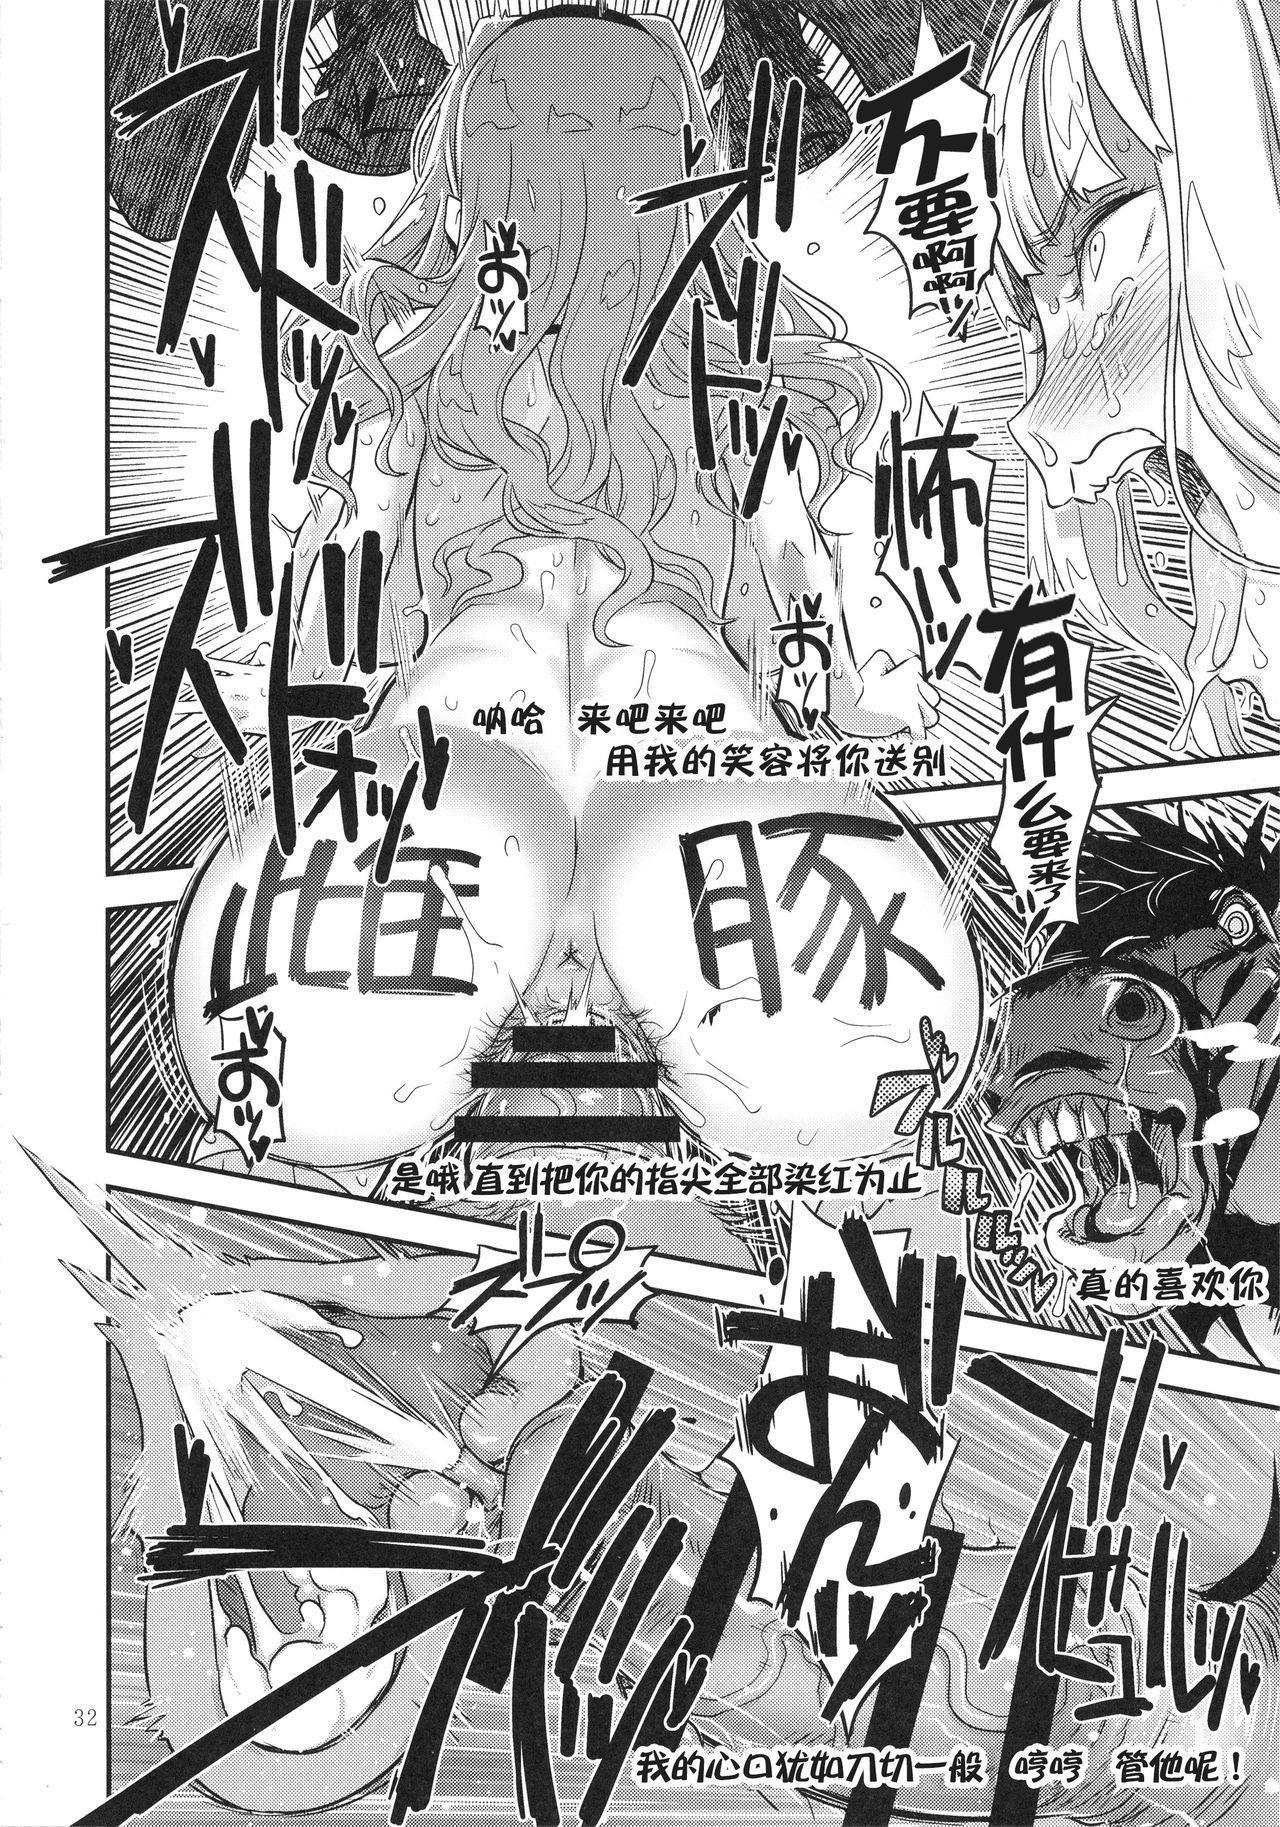 Koukai Tanetsuke Hentai Koubi 2 30